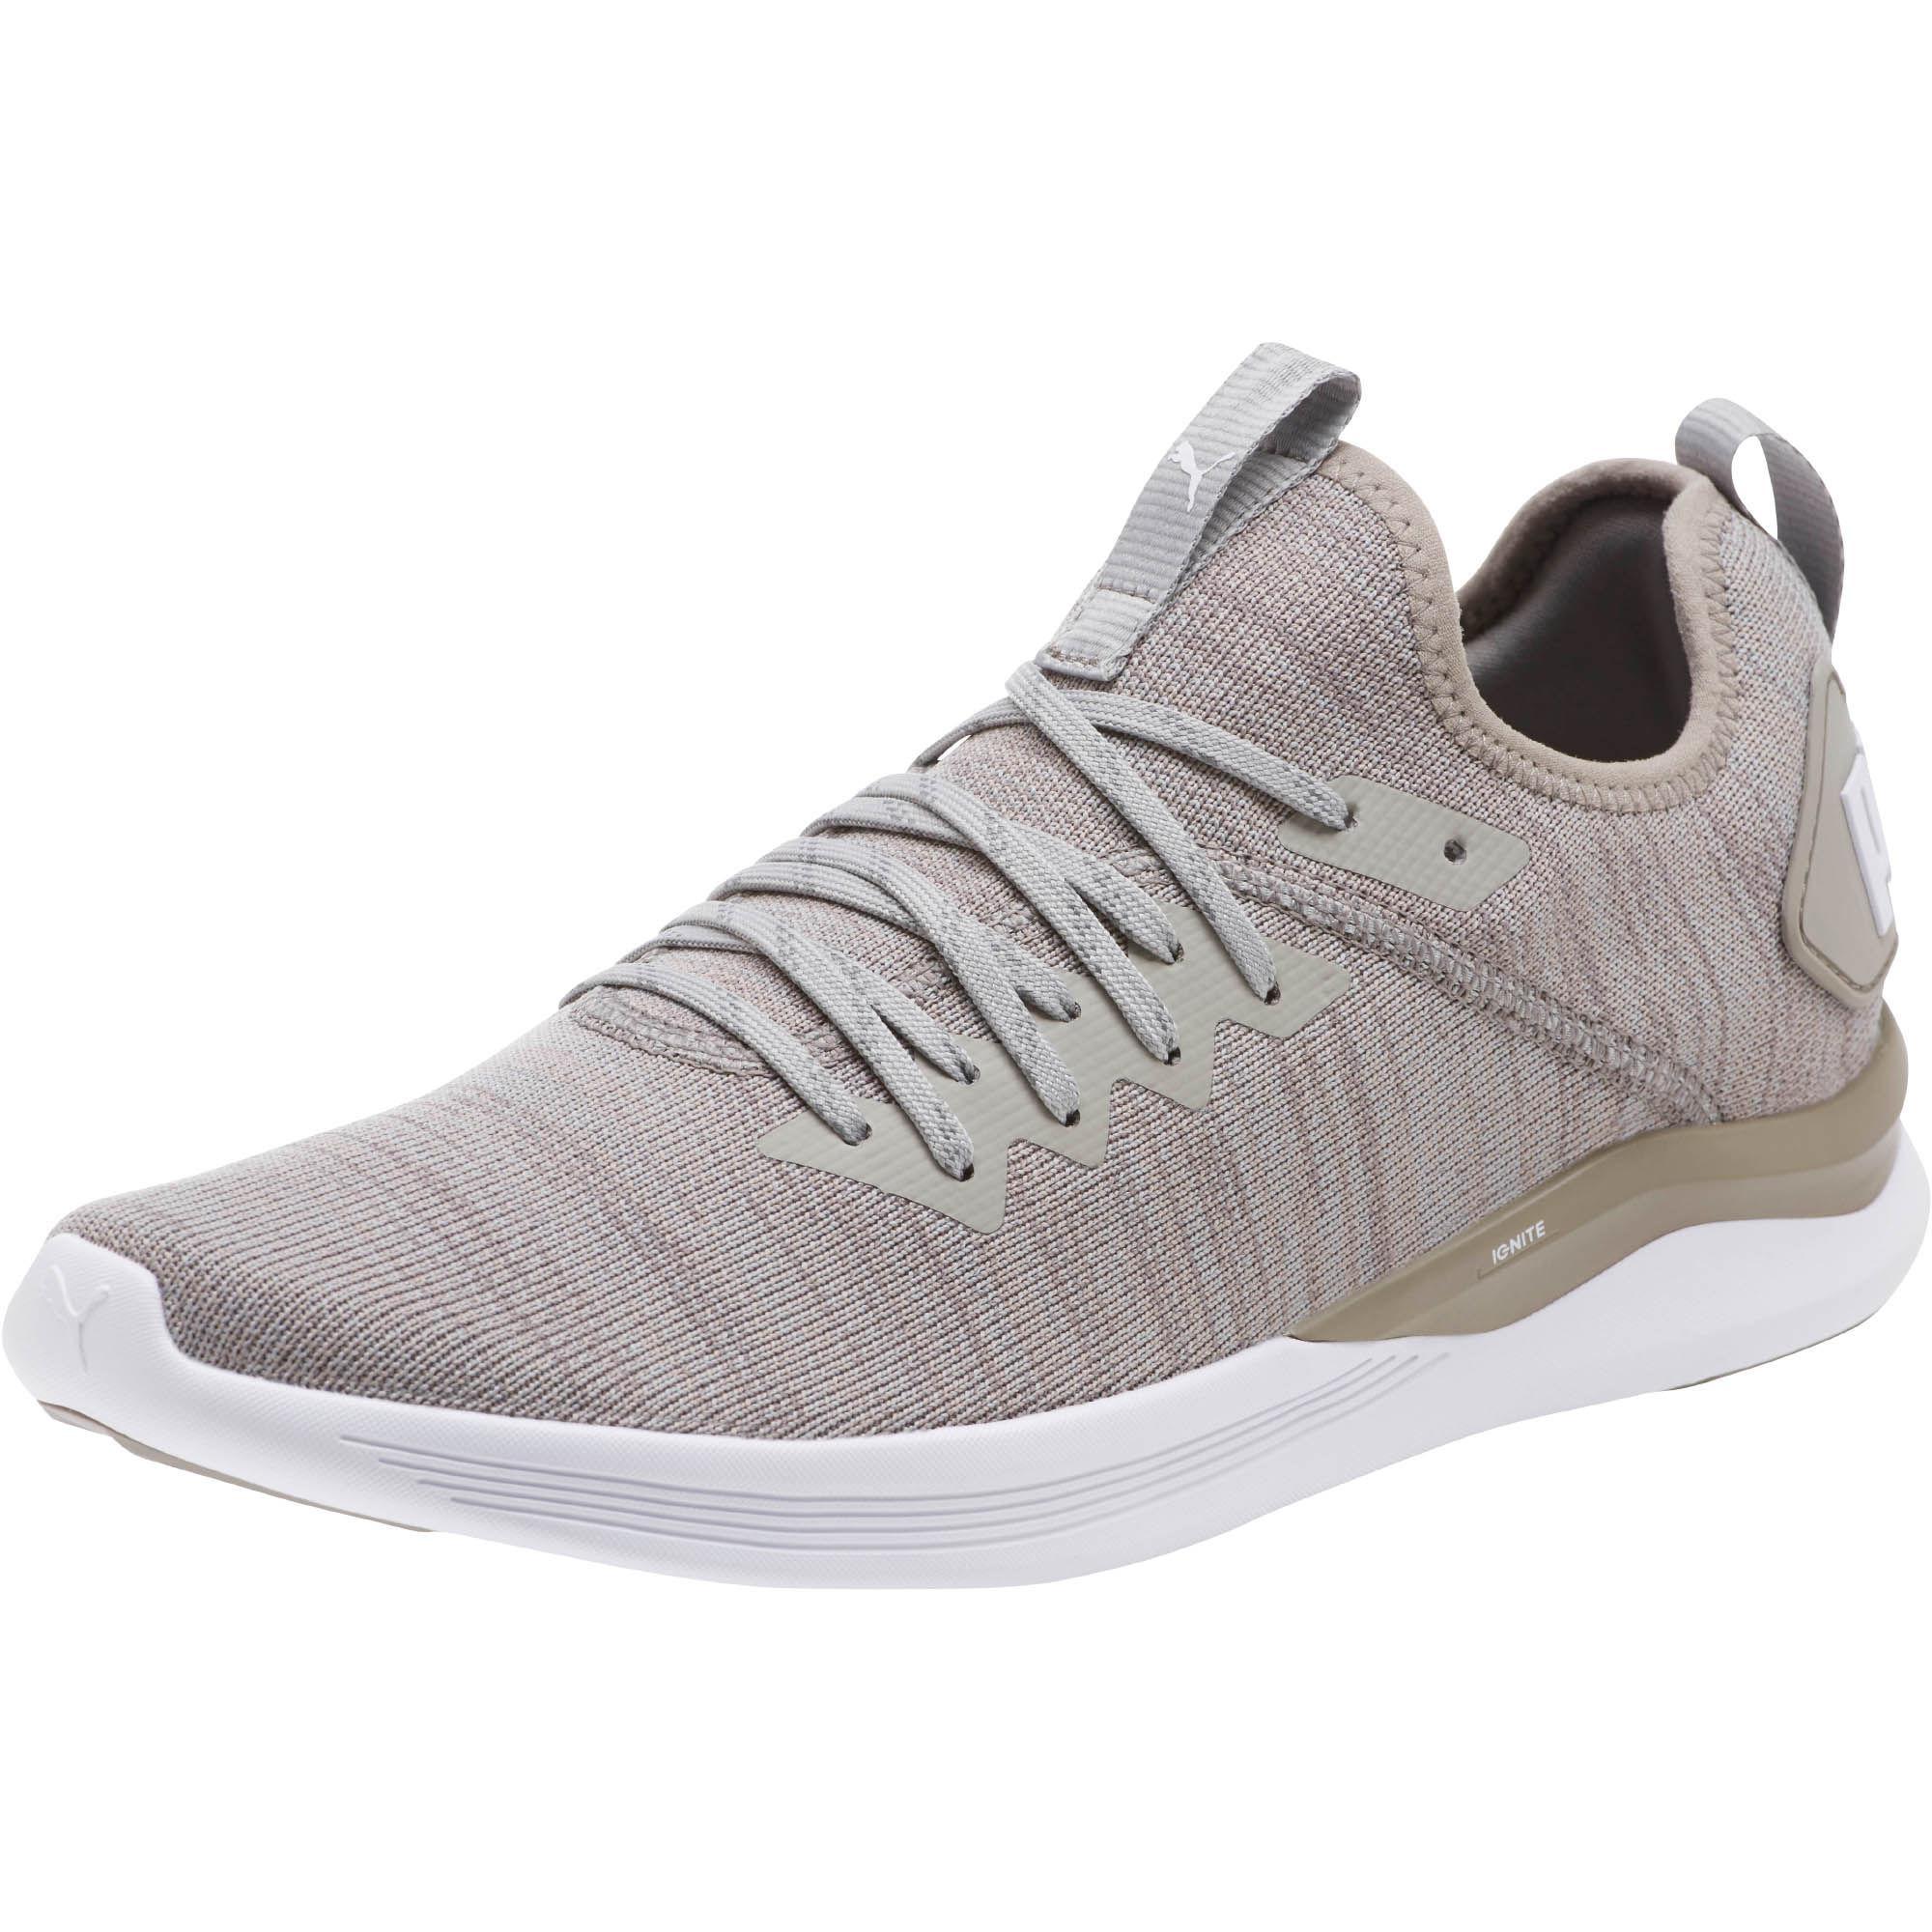 puma sneaker ignite flash